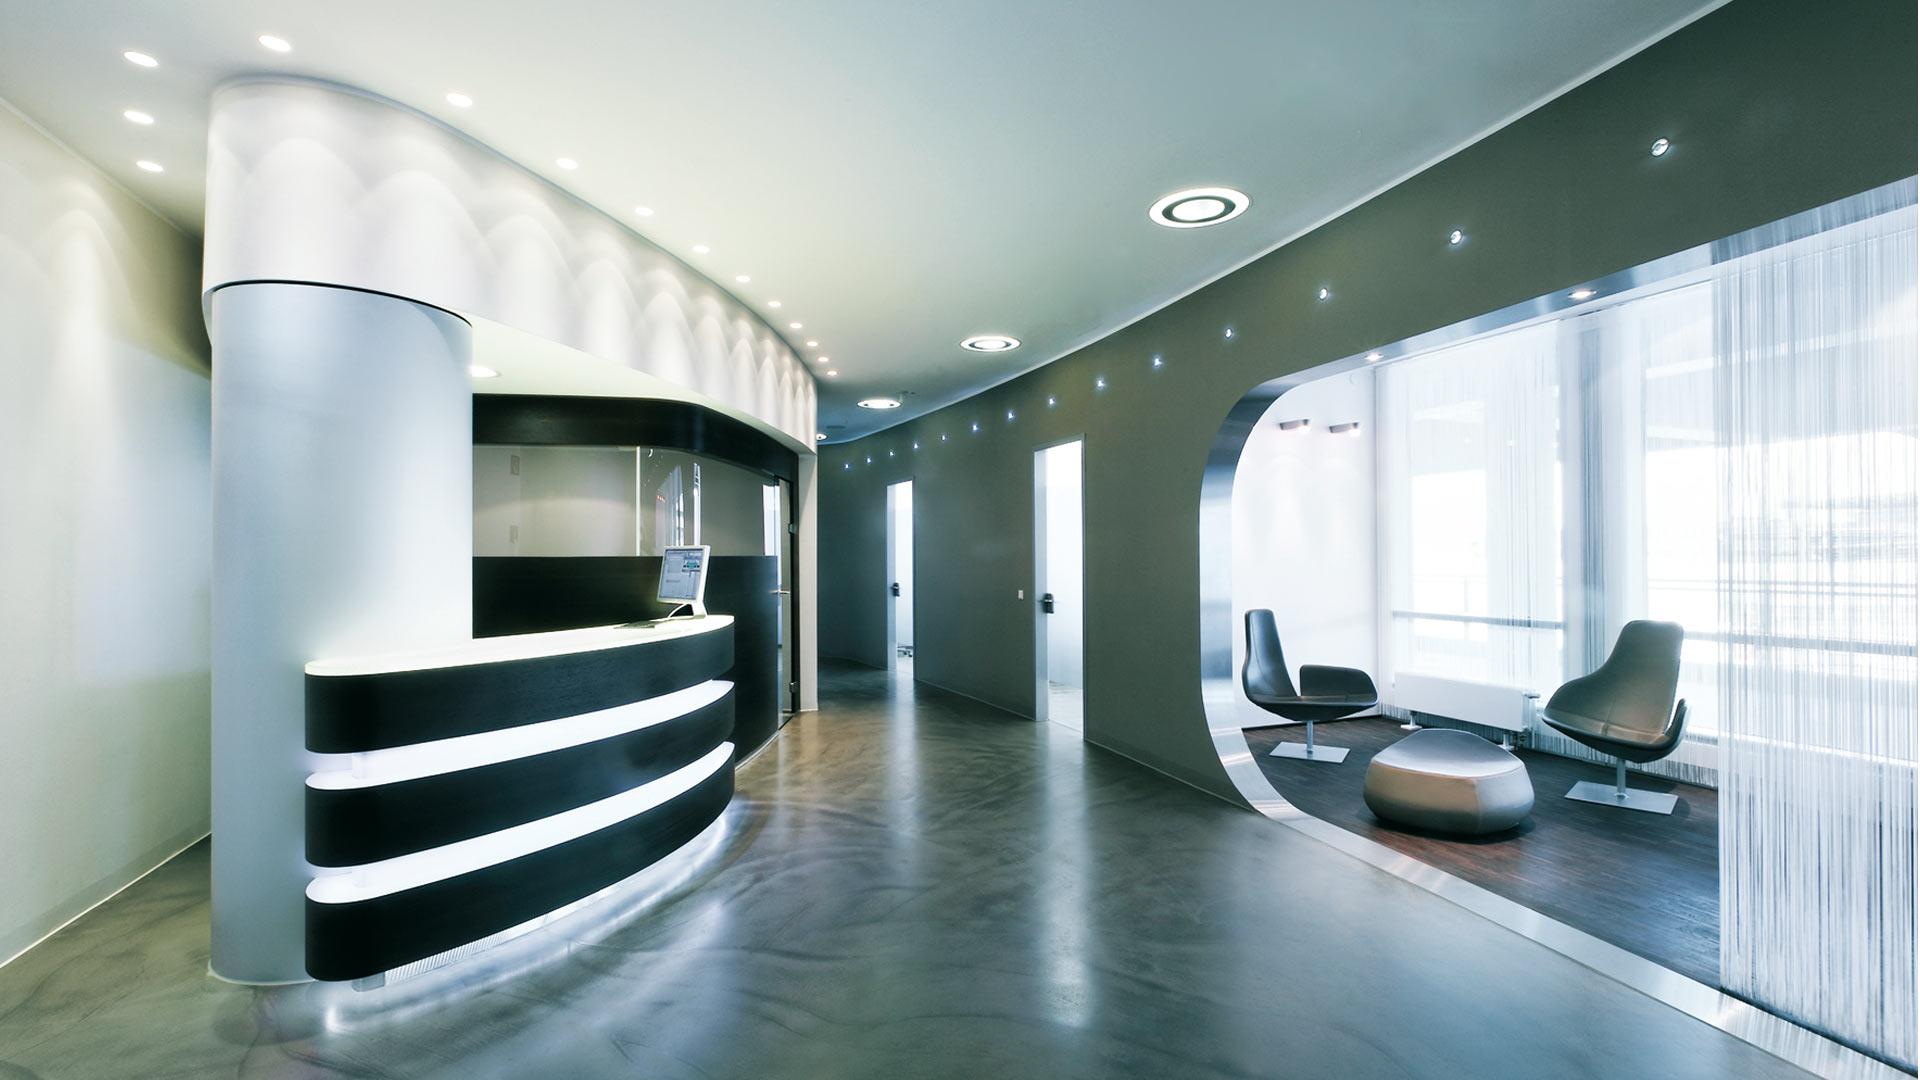 Z-MVZ dental suite Köln/Bonn Airport - Empfang